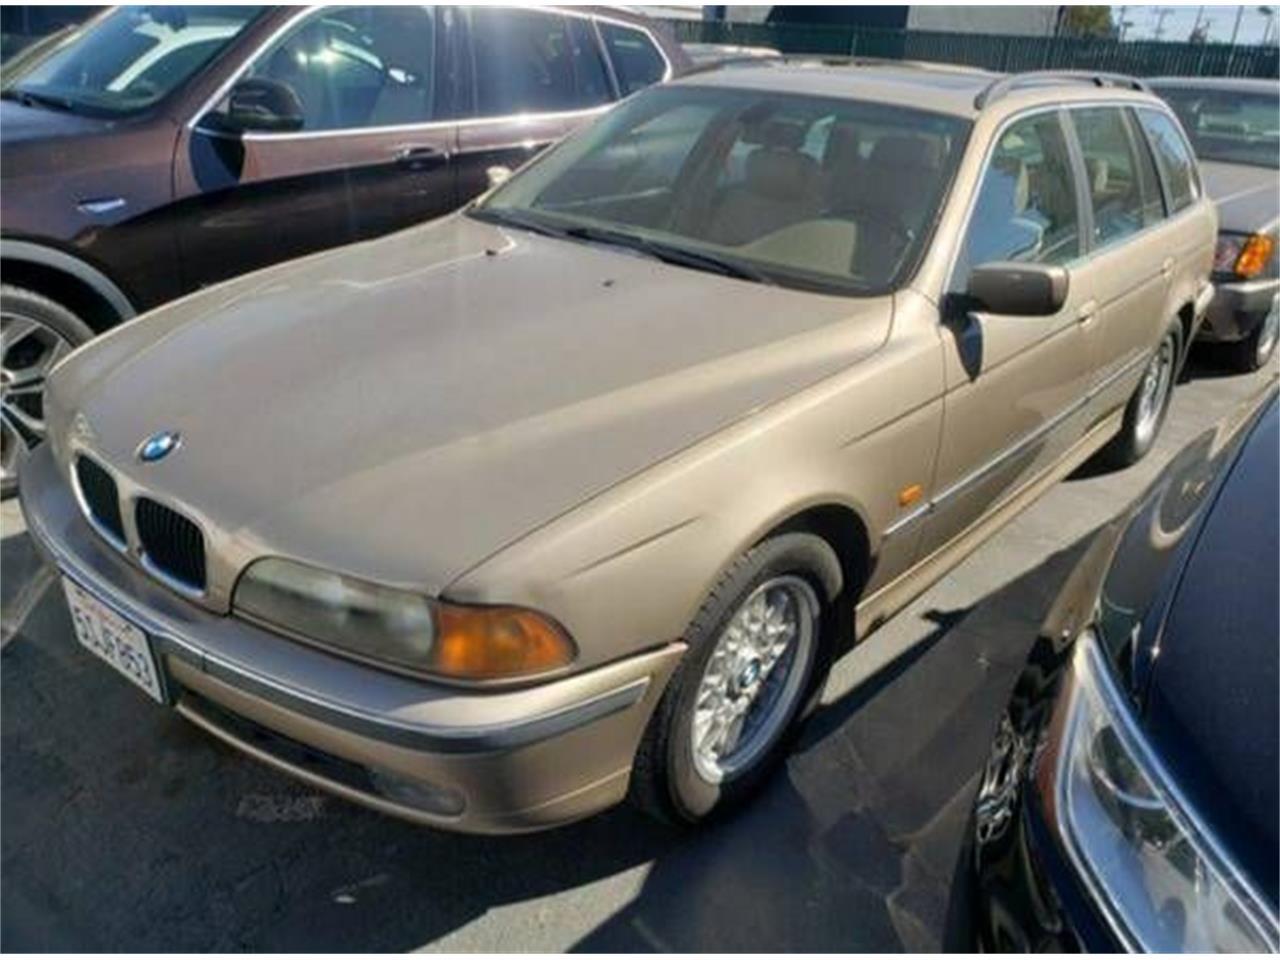 for sale 2000 bmw 5 series in cadillac, michigan cars - cadillac, mi at geebo